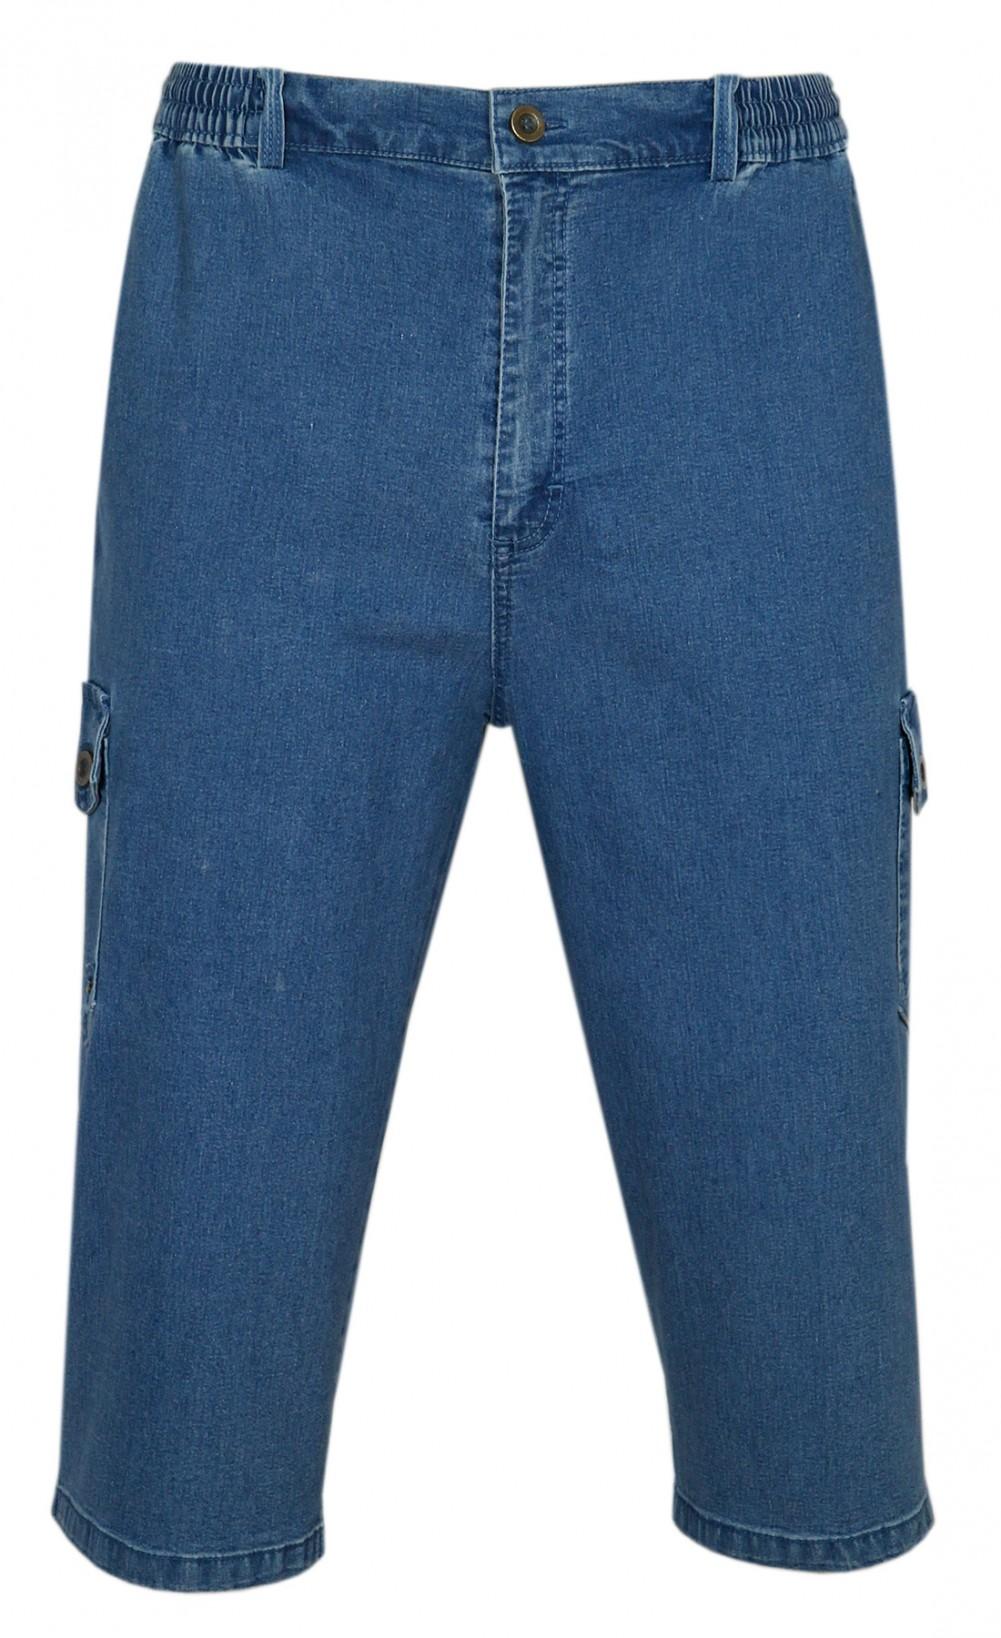 Stretch Caprijeans, 3/4 Cargo Shorts - Wadenlange Schlupfjeans Bermuda Herren - Blue